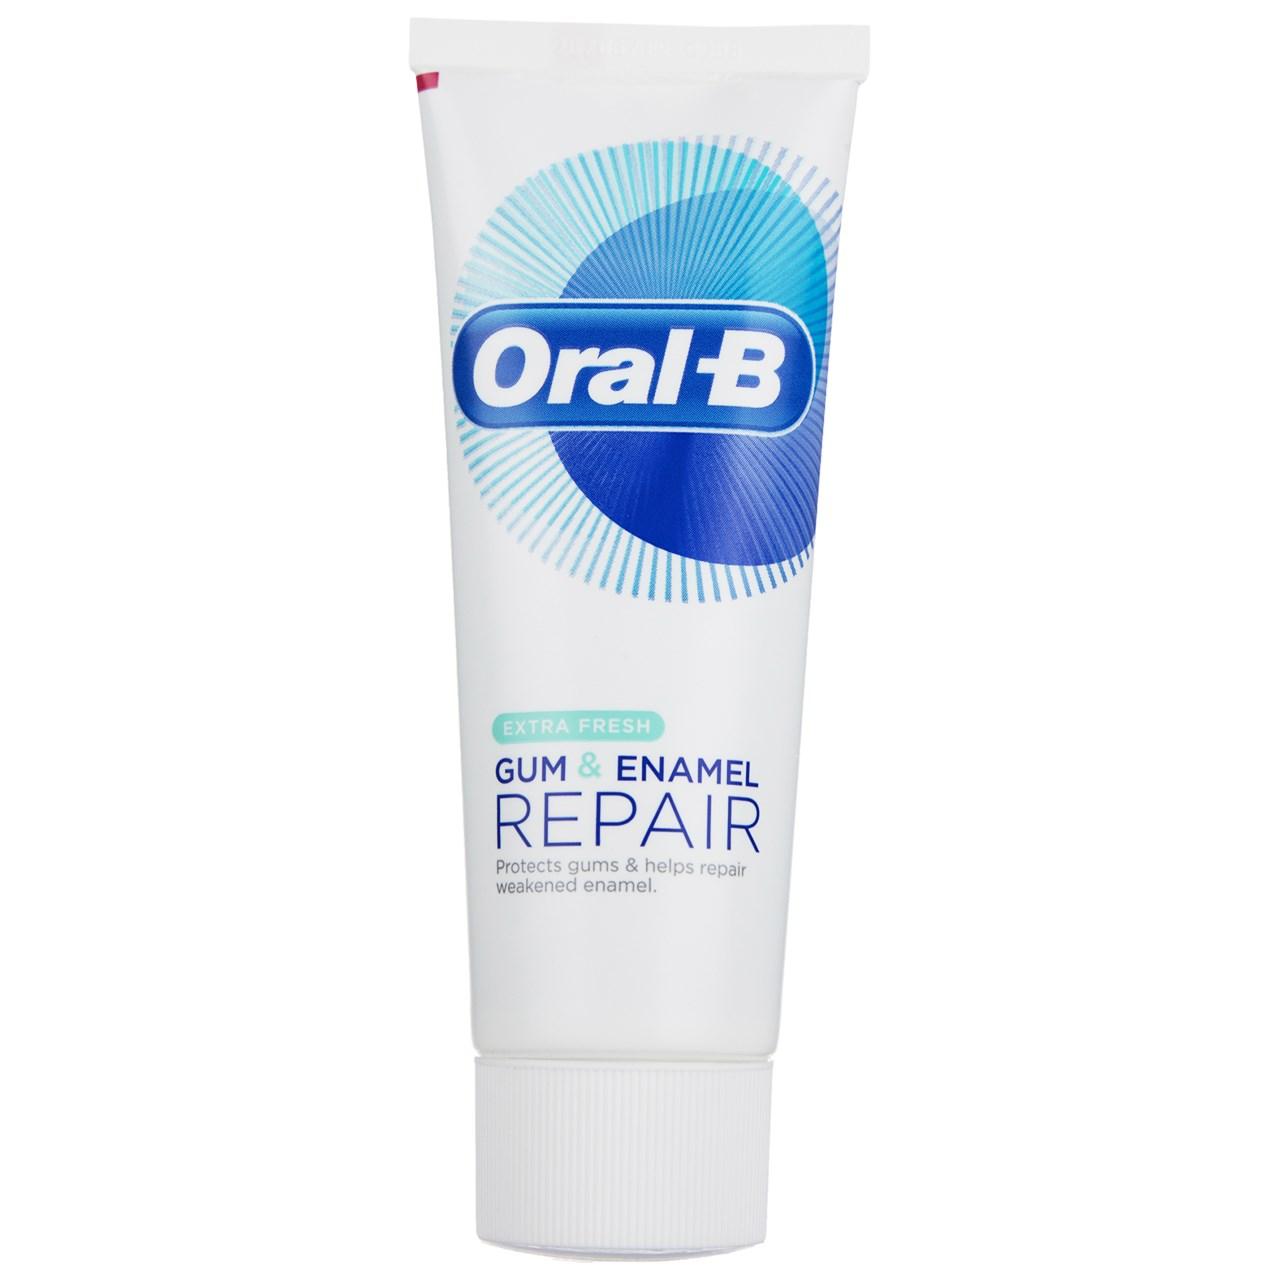 قیمت خمیر دندان اورال بی سری Gum And Enamel Repair مدل Extra Fresh حجم 75 میلی لیتر